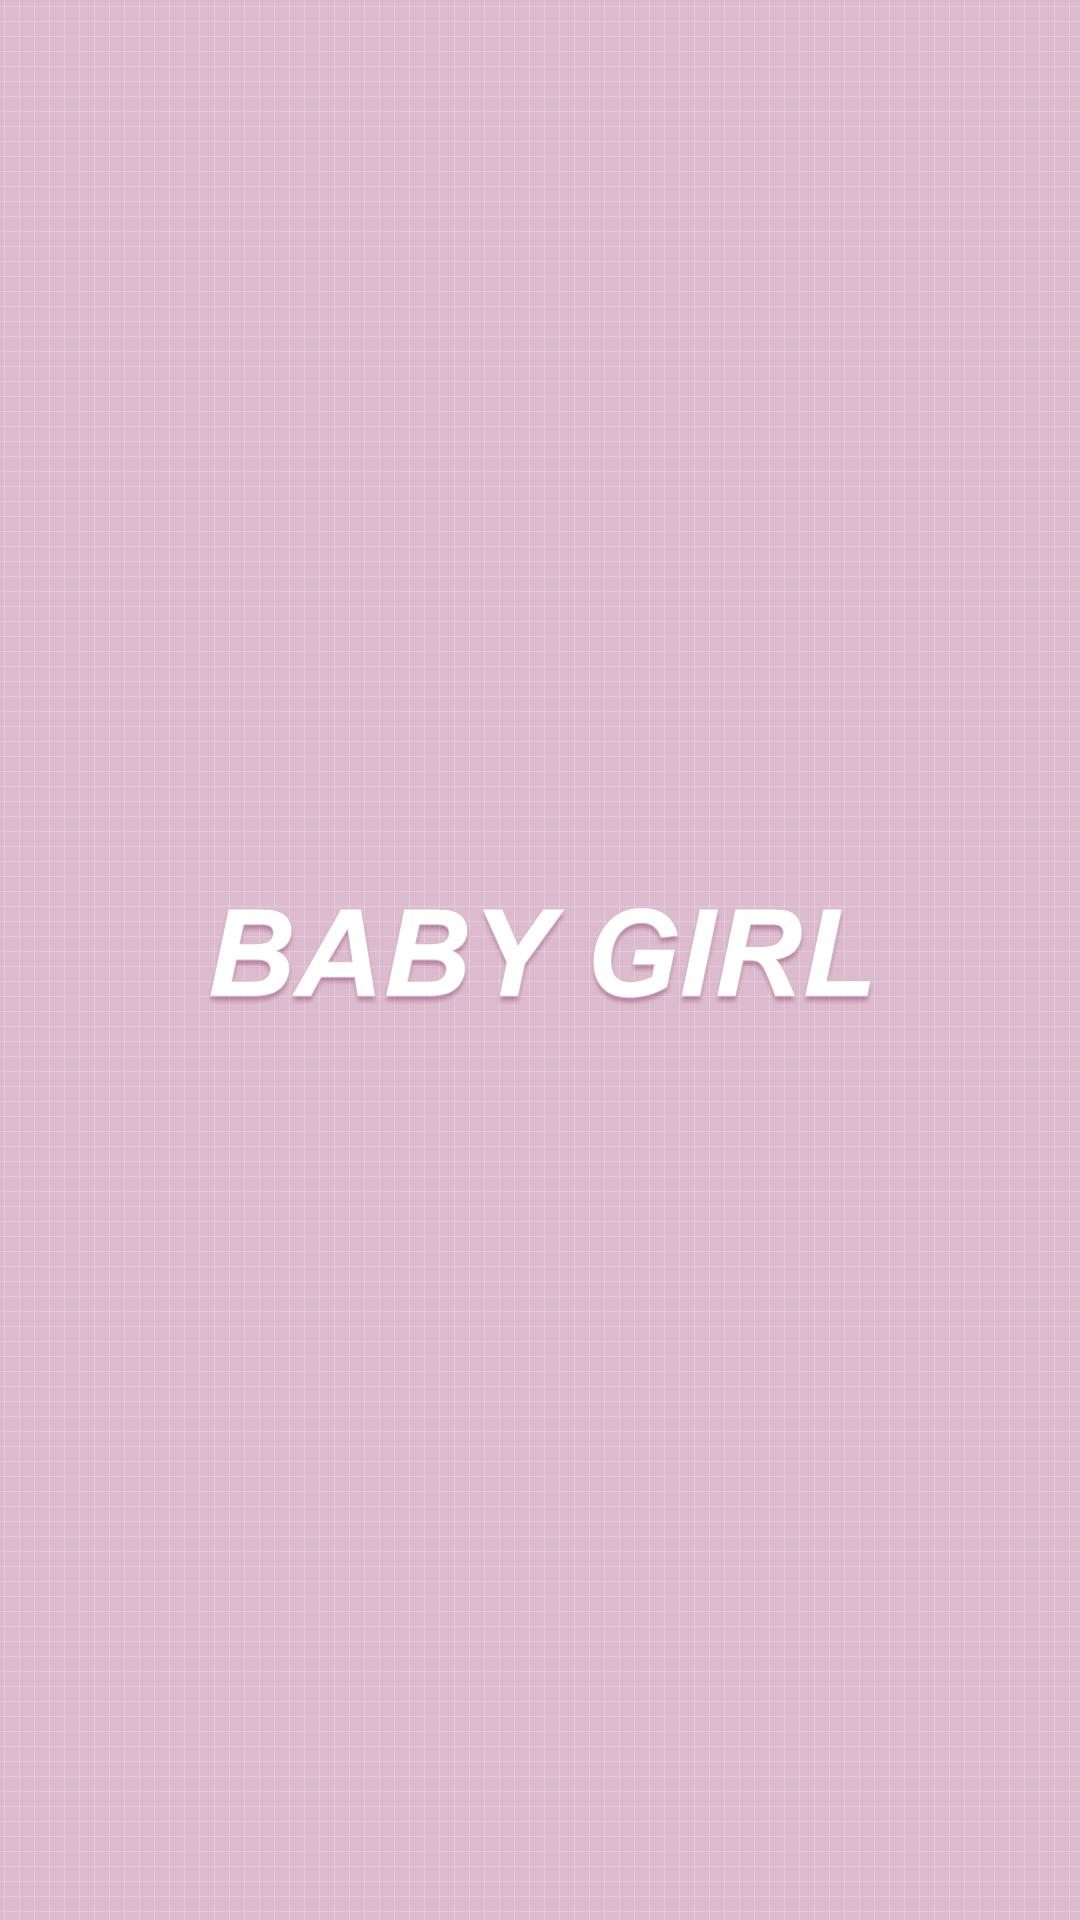 Baby Girl Aesthetic Wallpapers Top Free Baby Girl Aesthetic Backgrounds Wallpaperaccess Baby Girl Wallpaper Baby Pink Aesthetic Pink Wallpaper